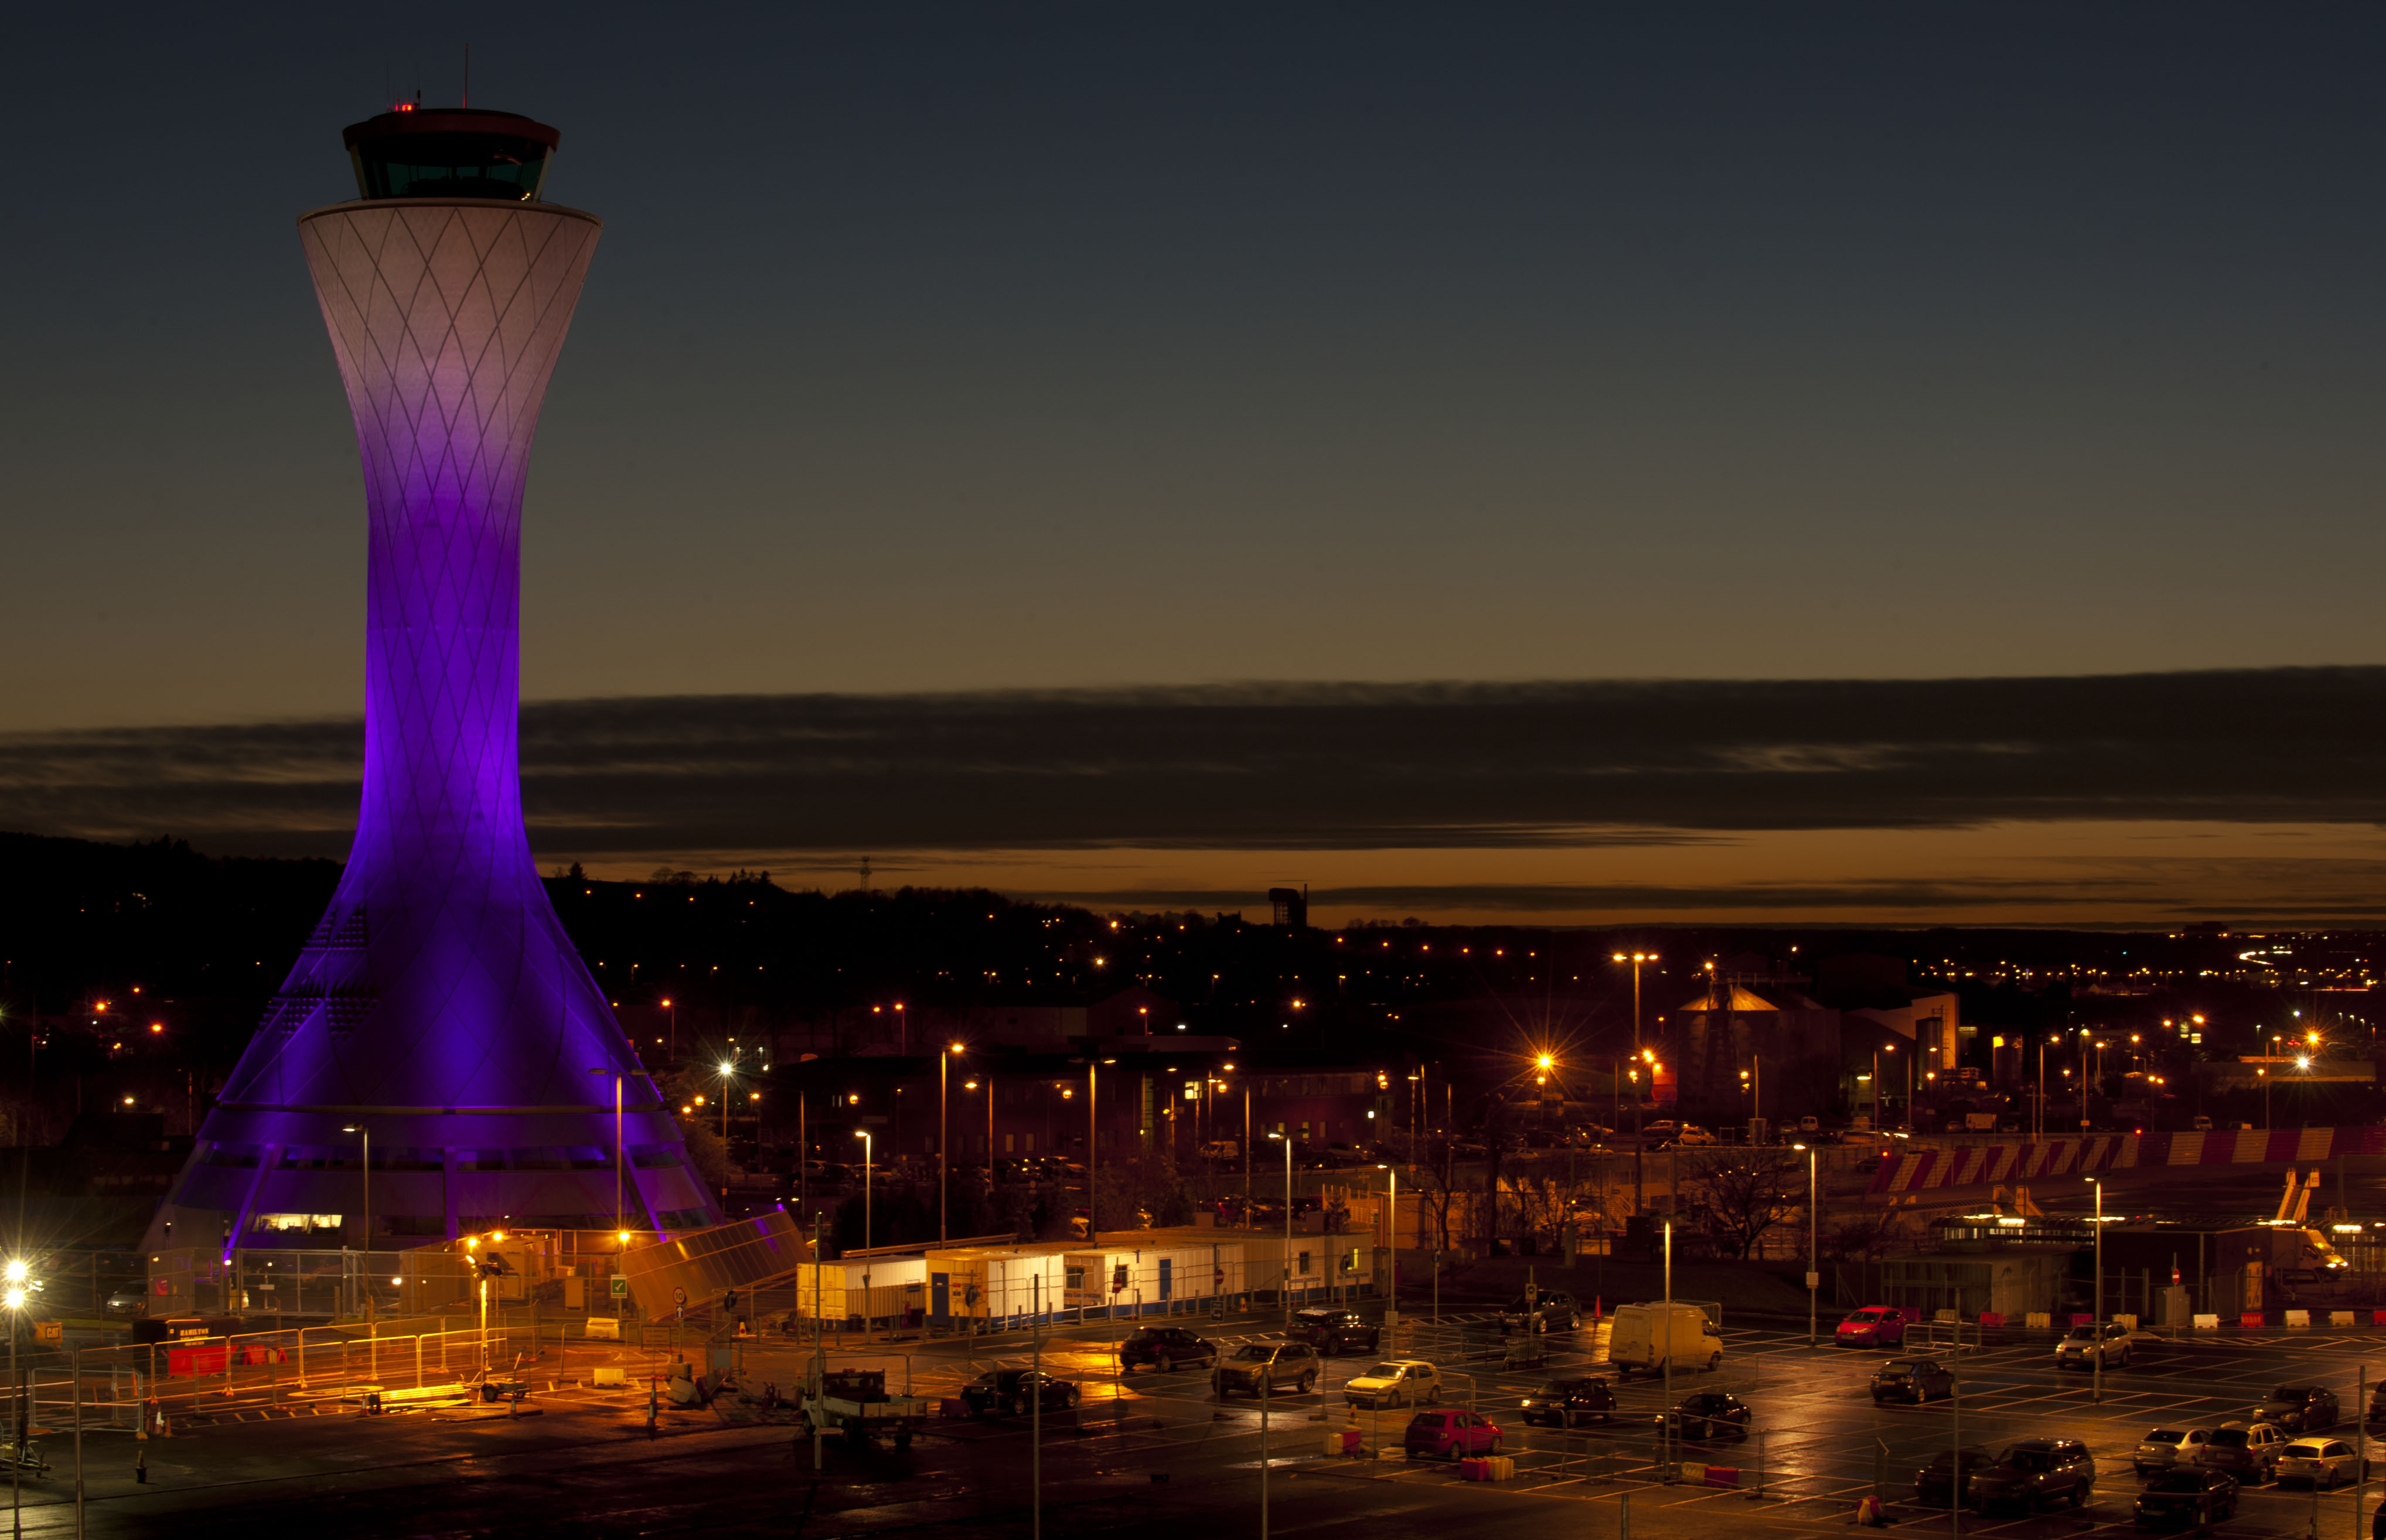 EDINBURGH AIRPORT PINK TOWER